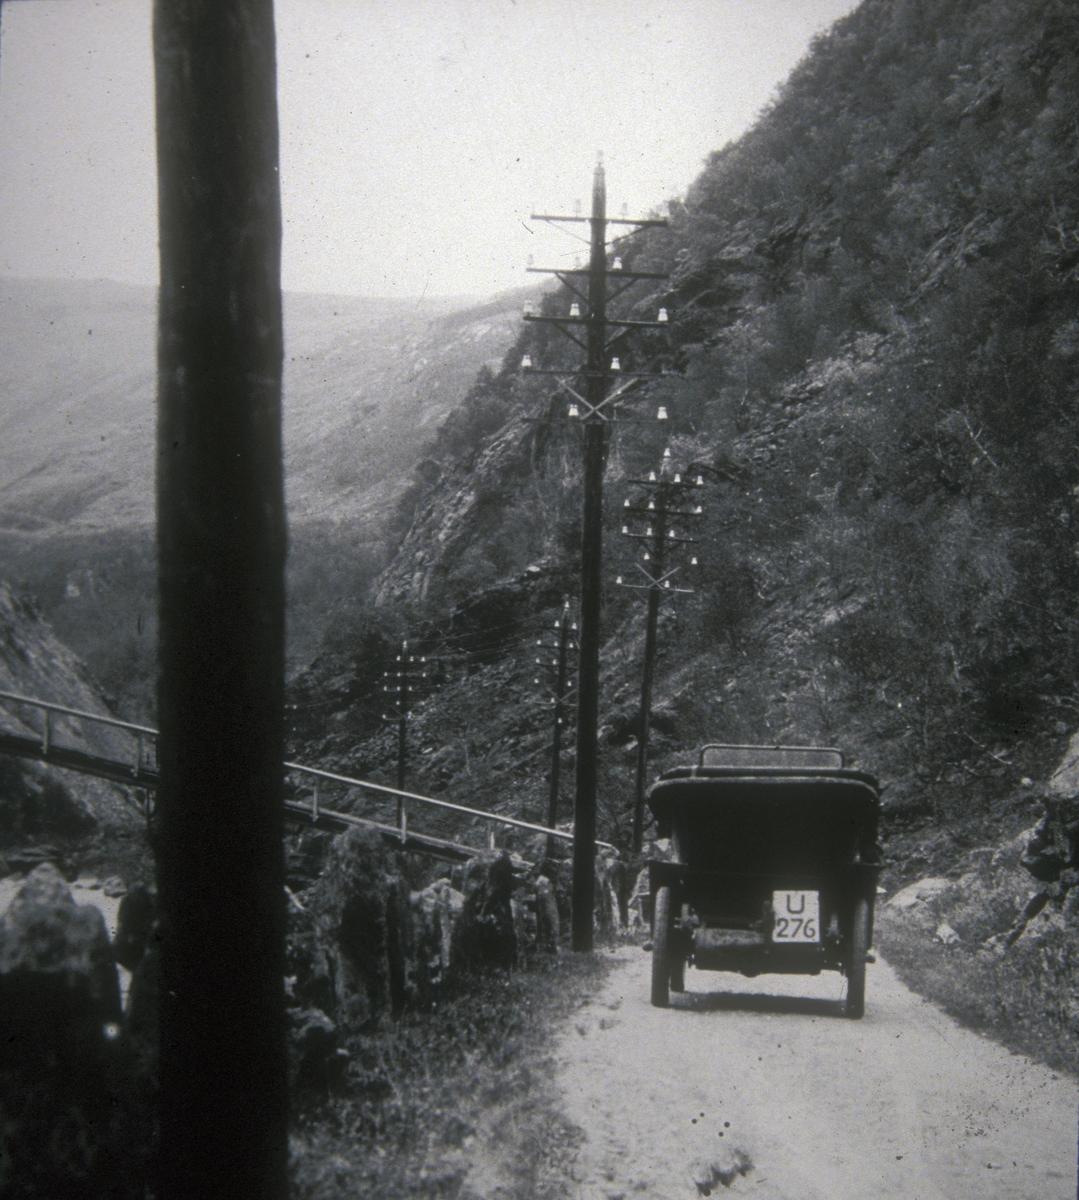 Ved Nystubekken gangbru over Driva i Drivdalen. Bilen tilhørte lensmann Øivind Hoel, Oppdal.